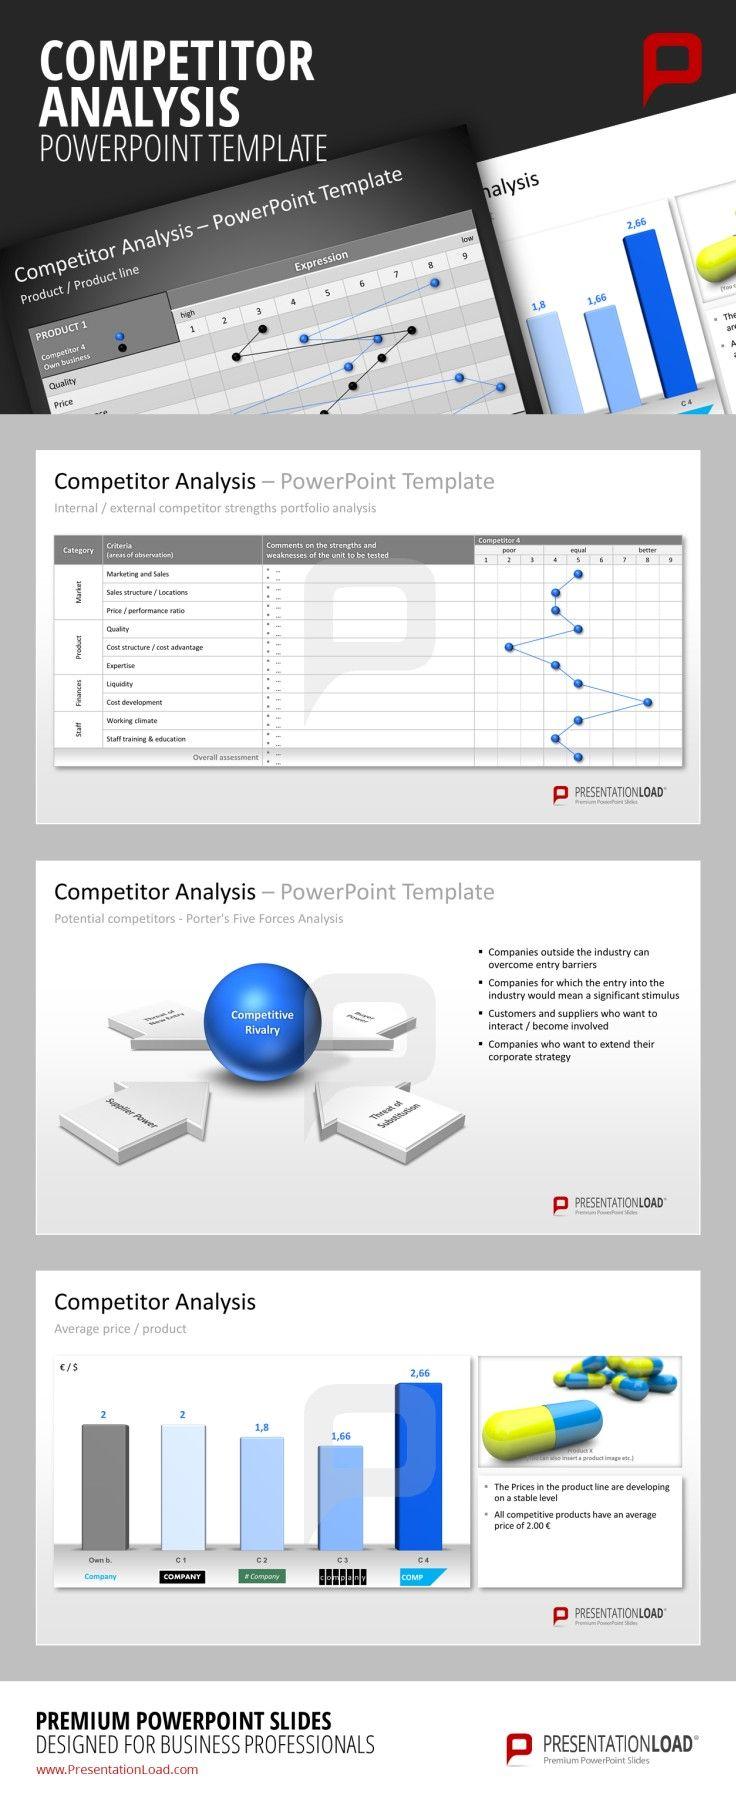 Competitor Analysis Presentationload Competitor Analysis Competitive Analysis Powerpoint